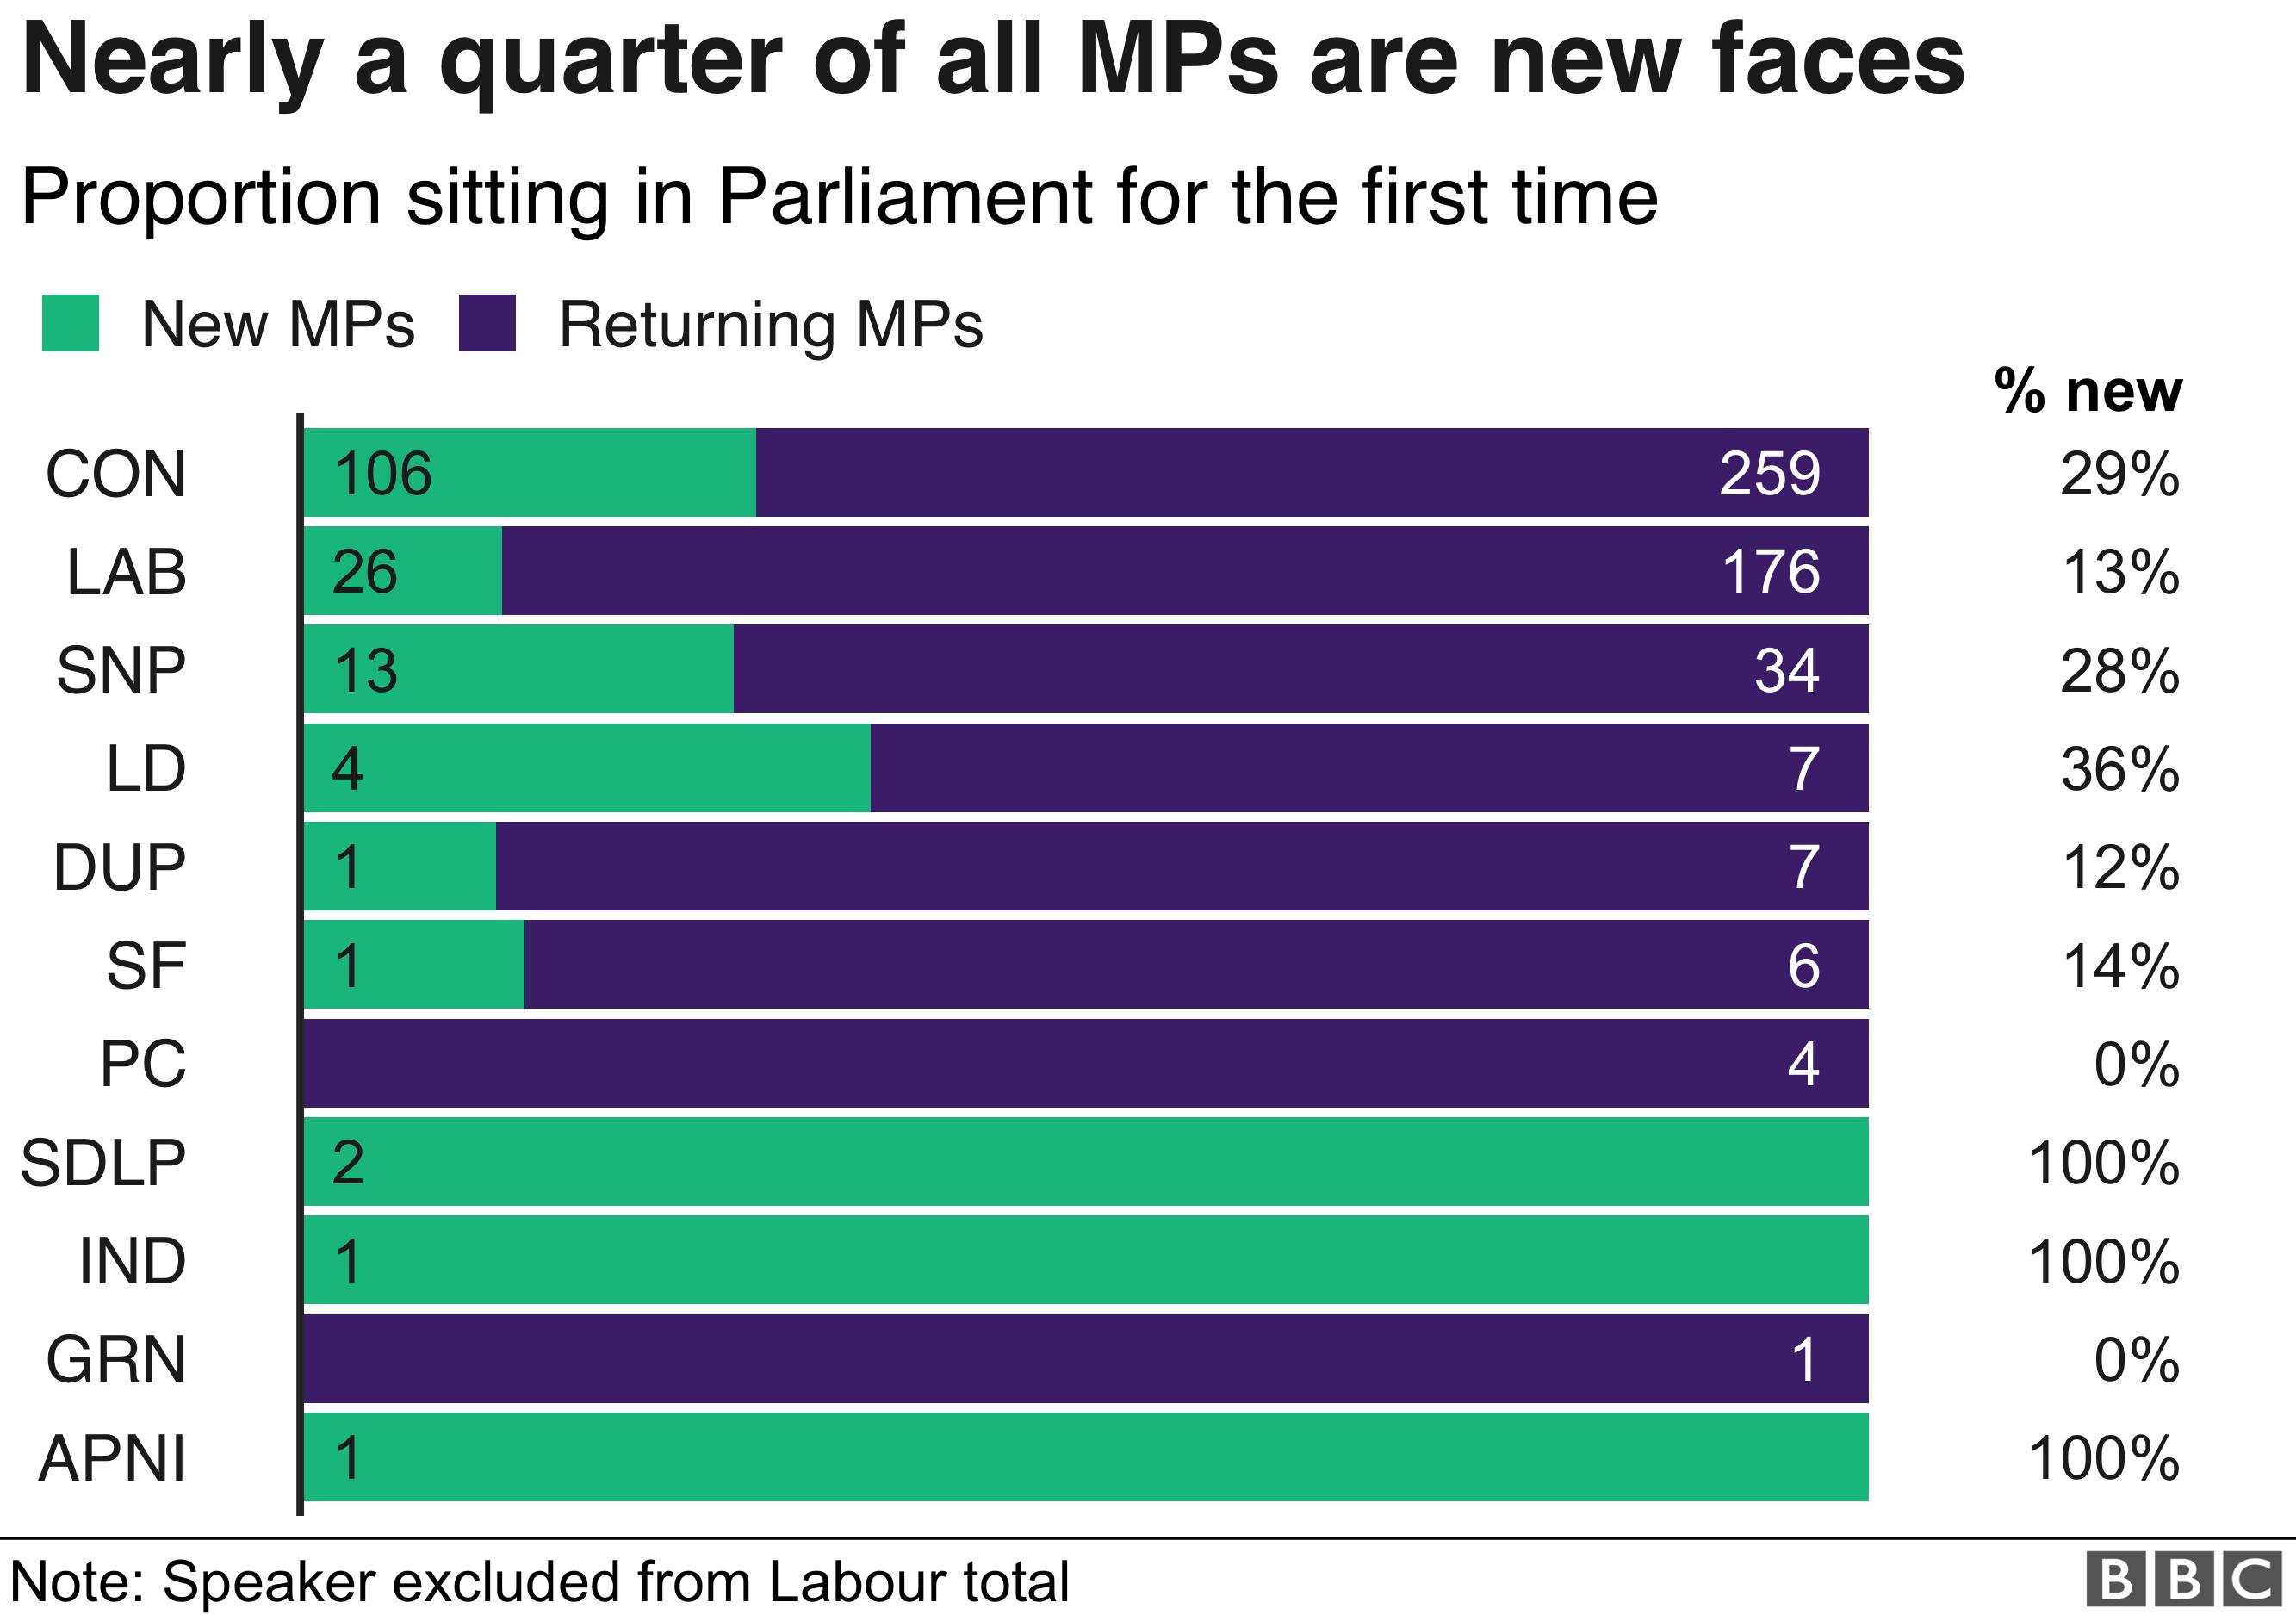 New MPs